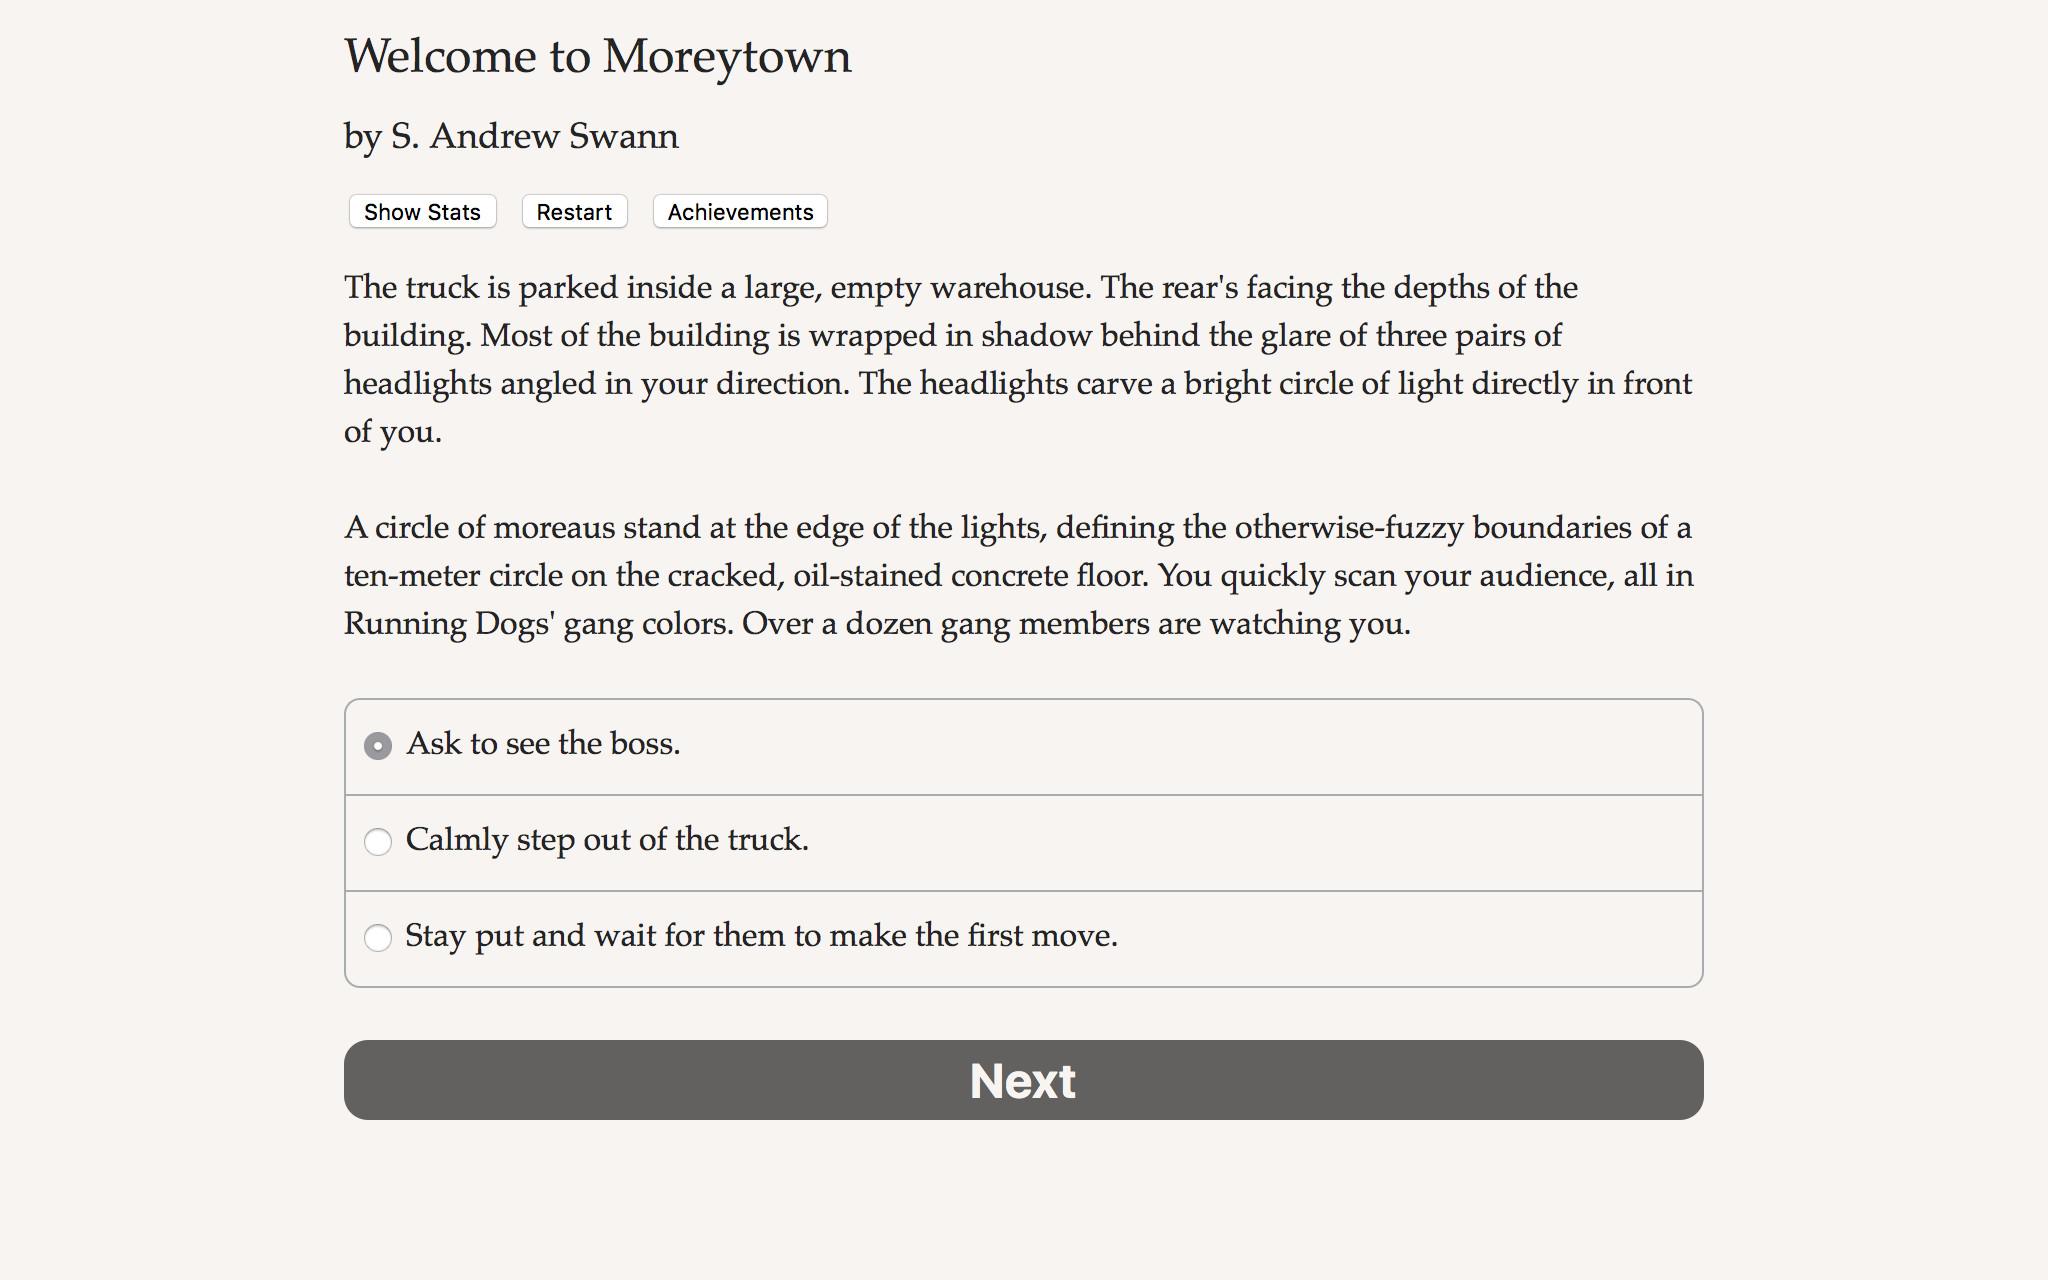 Welcome to Moreytown screenshot